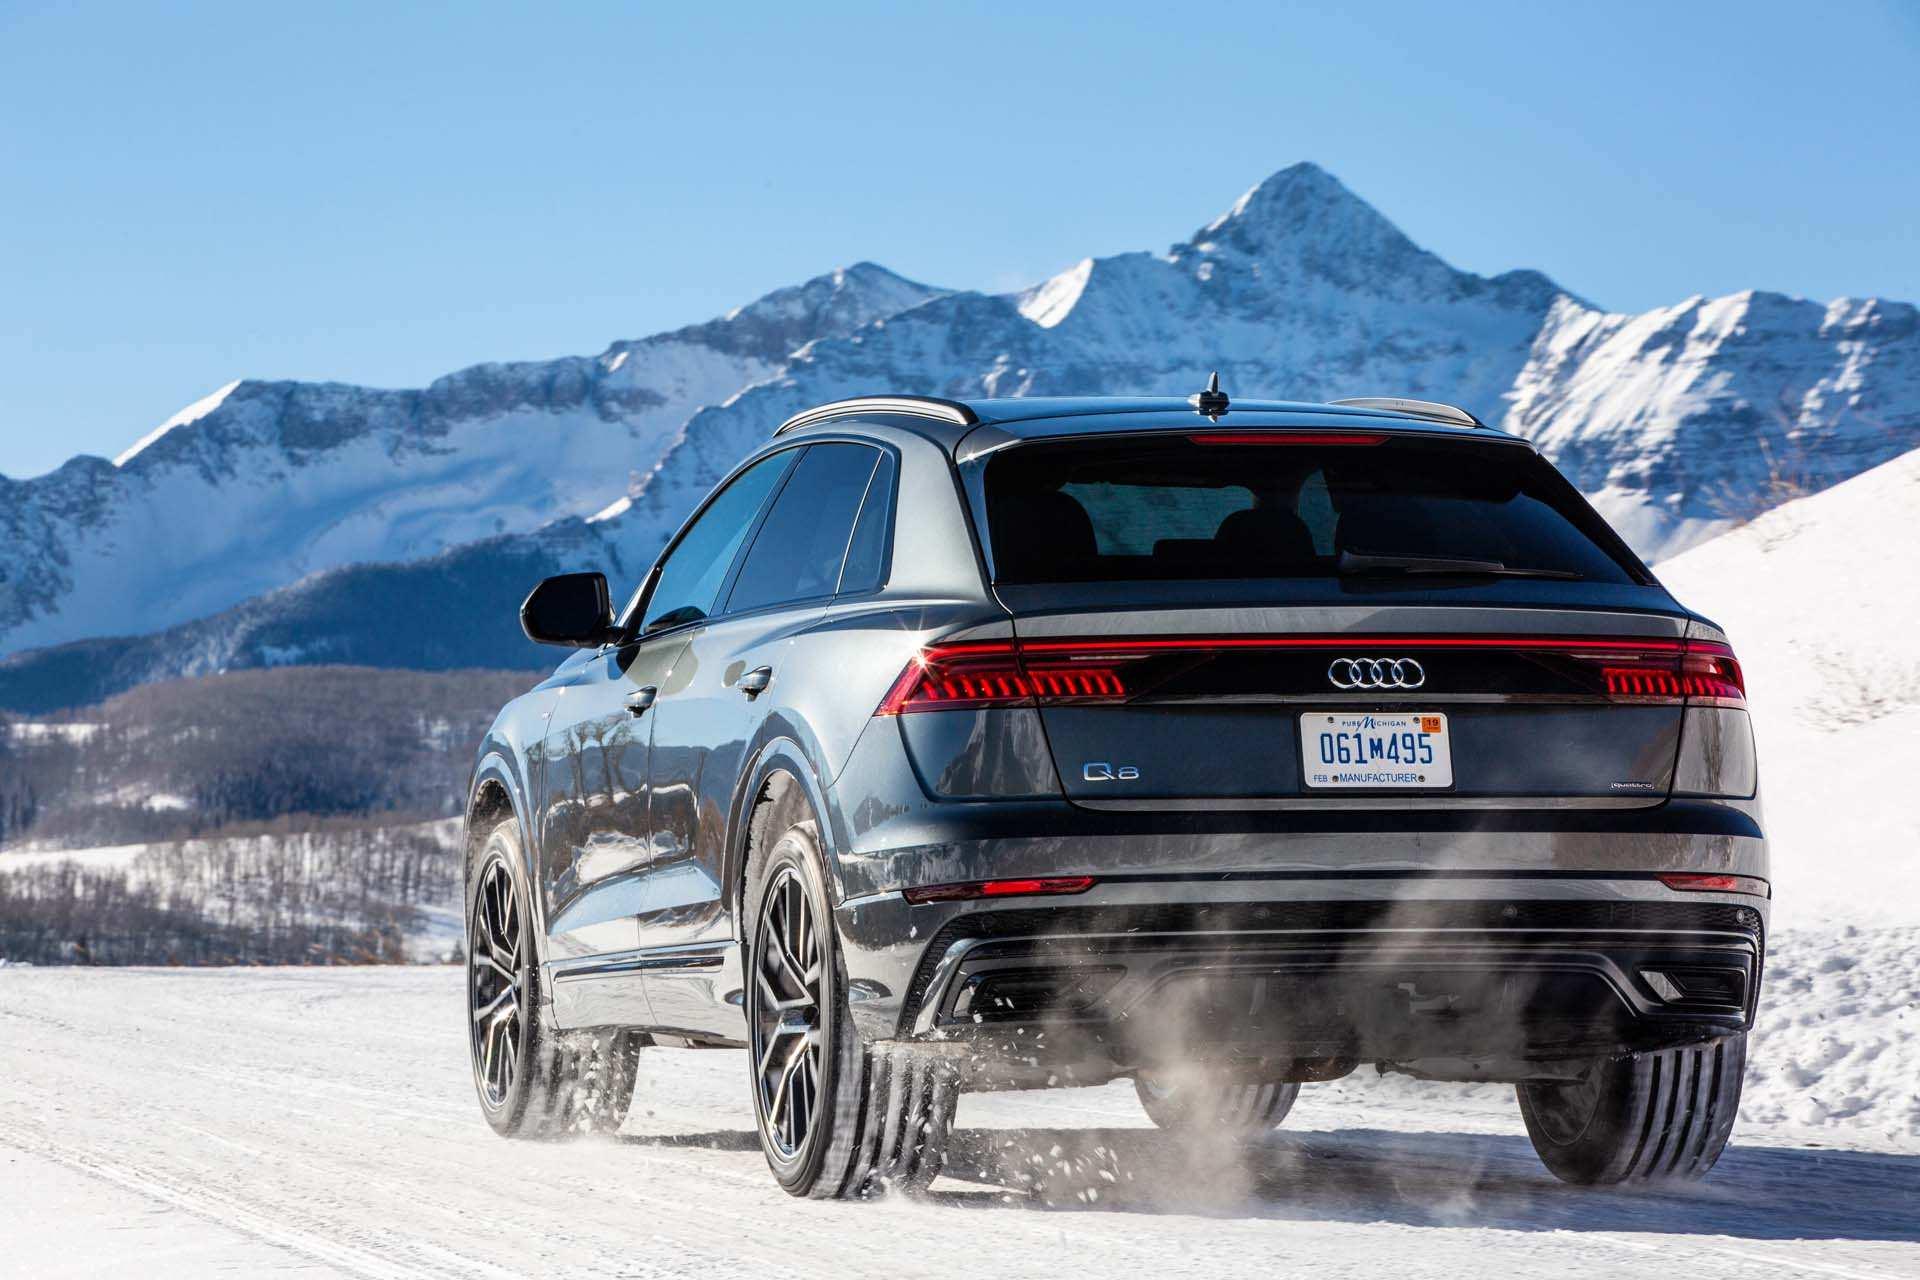 16 Concept of Audi Q8 2020 Release Date for Audi Q8 2020